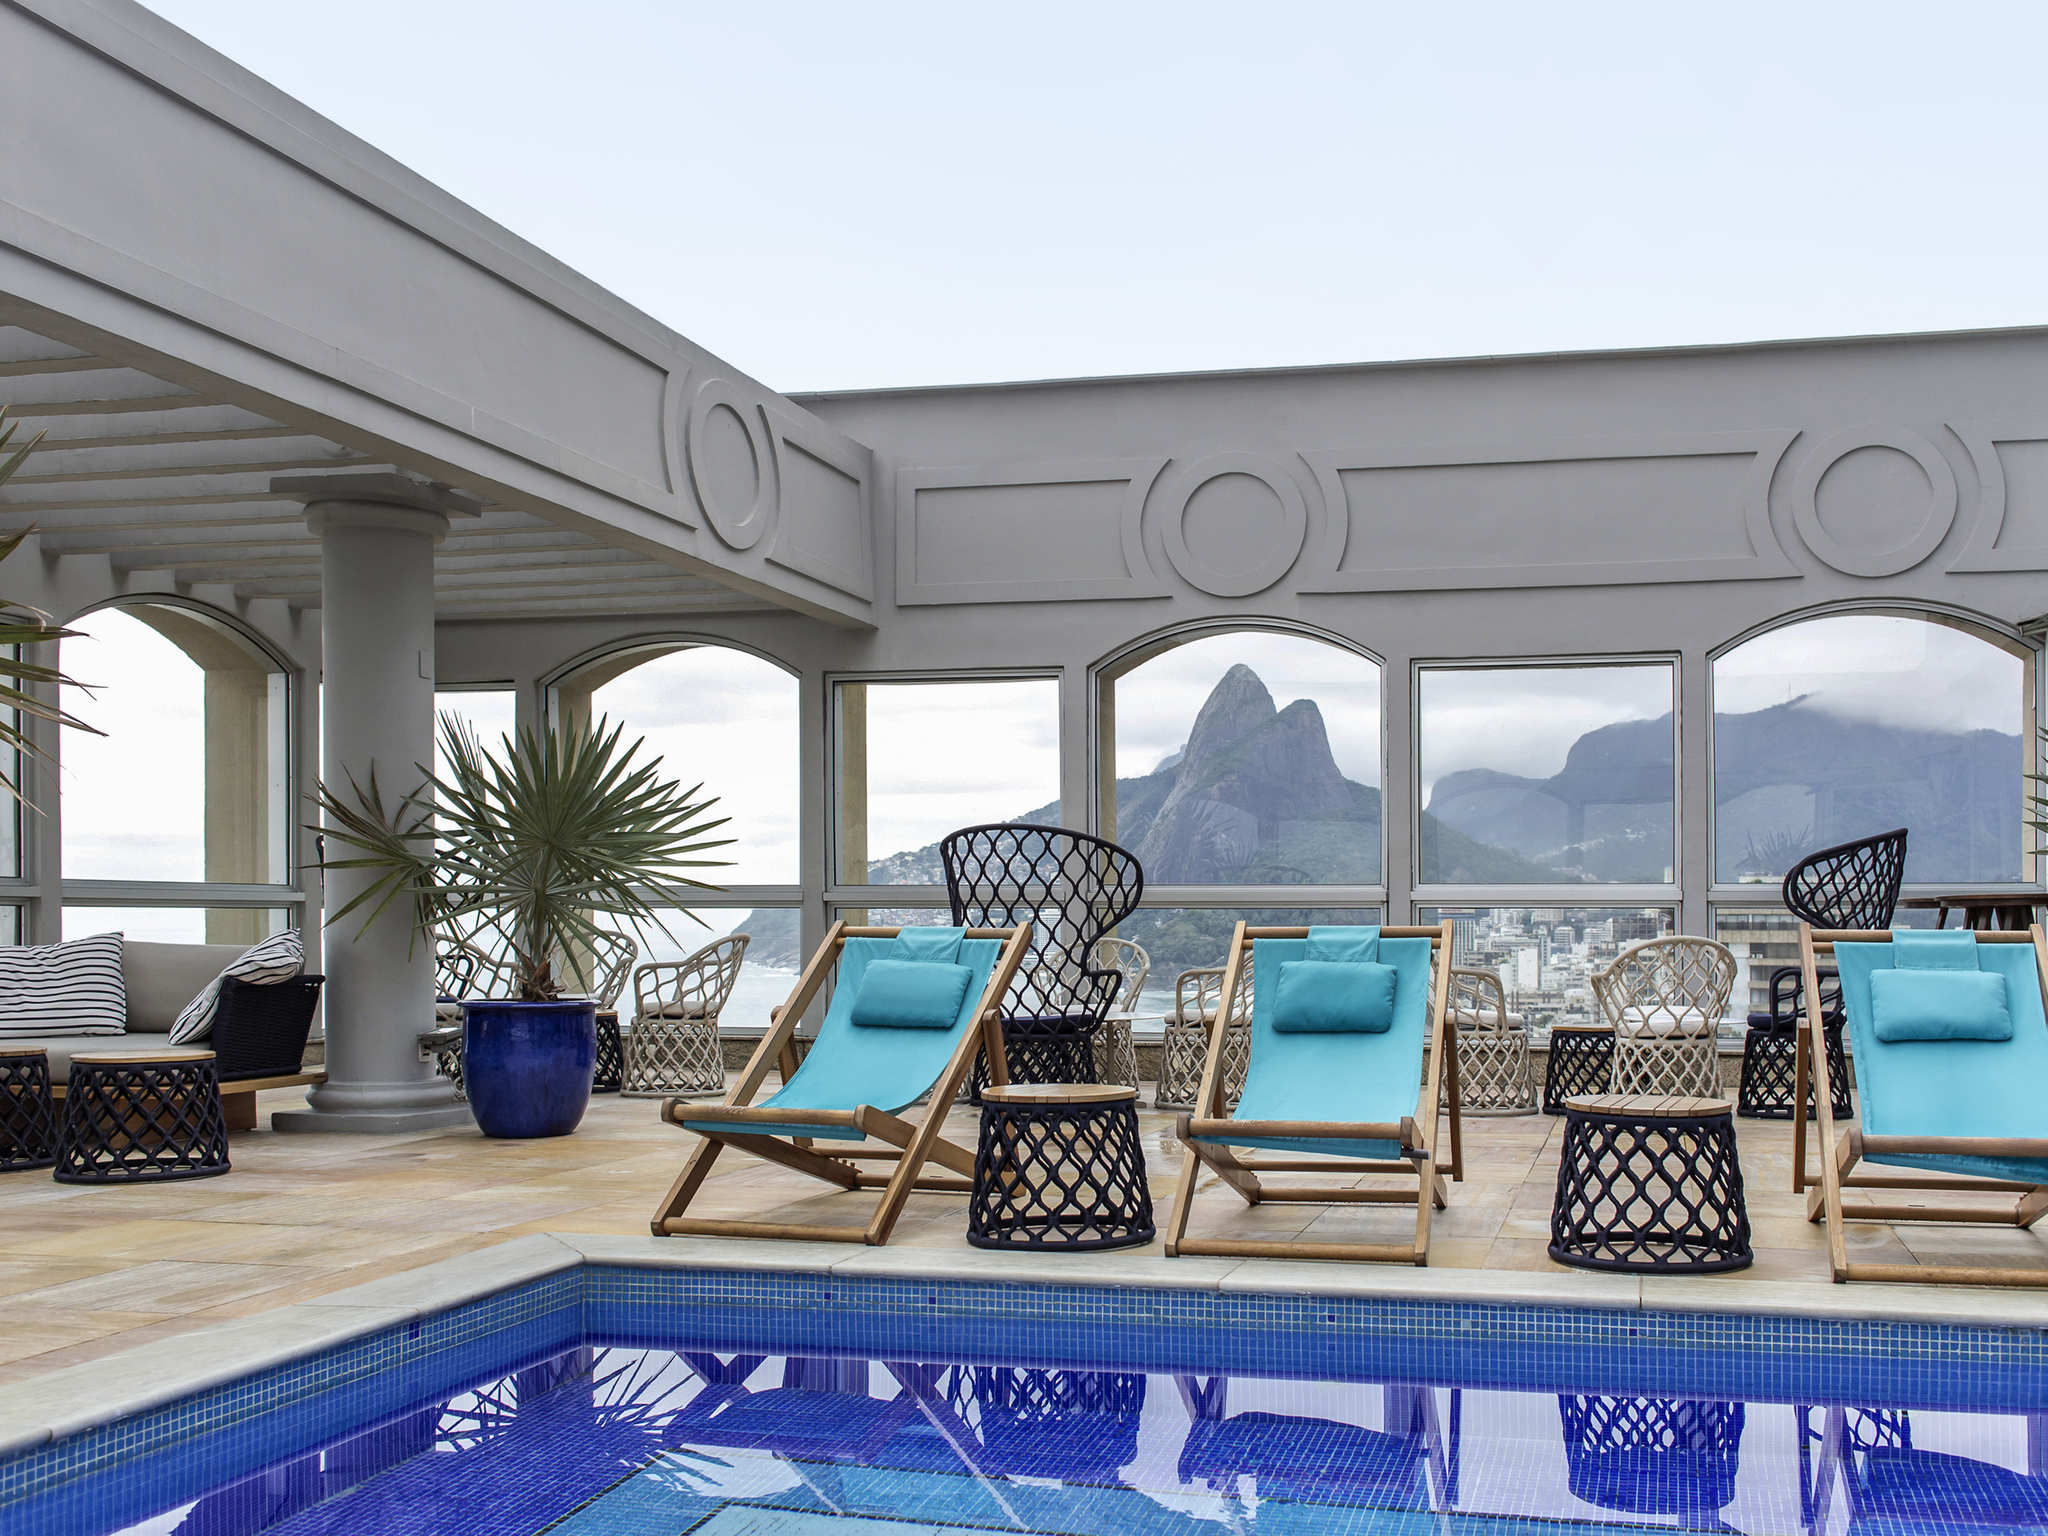 Hotell – Sofitel Rio de Janeiro Ipanema